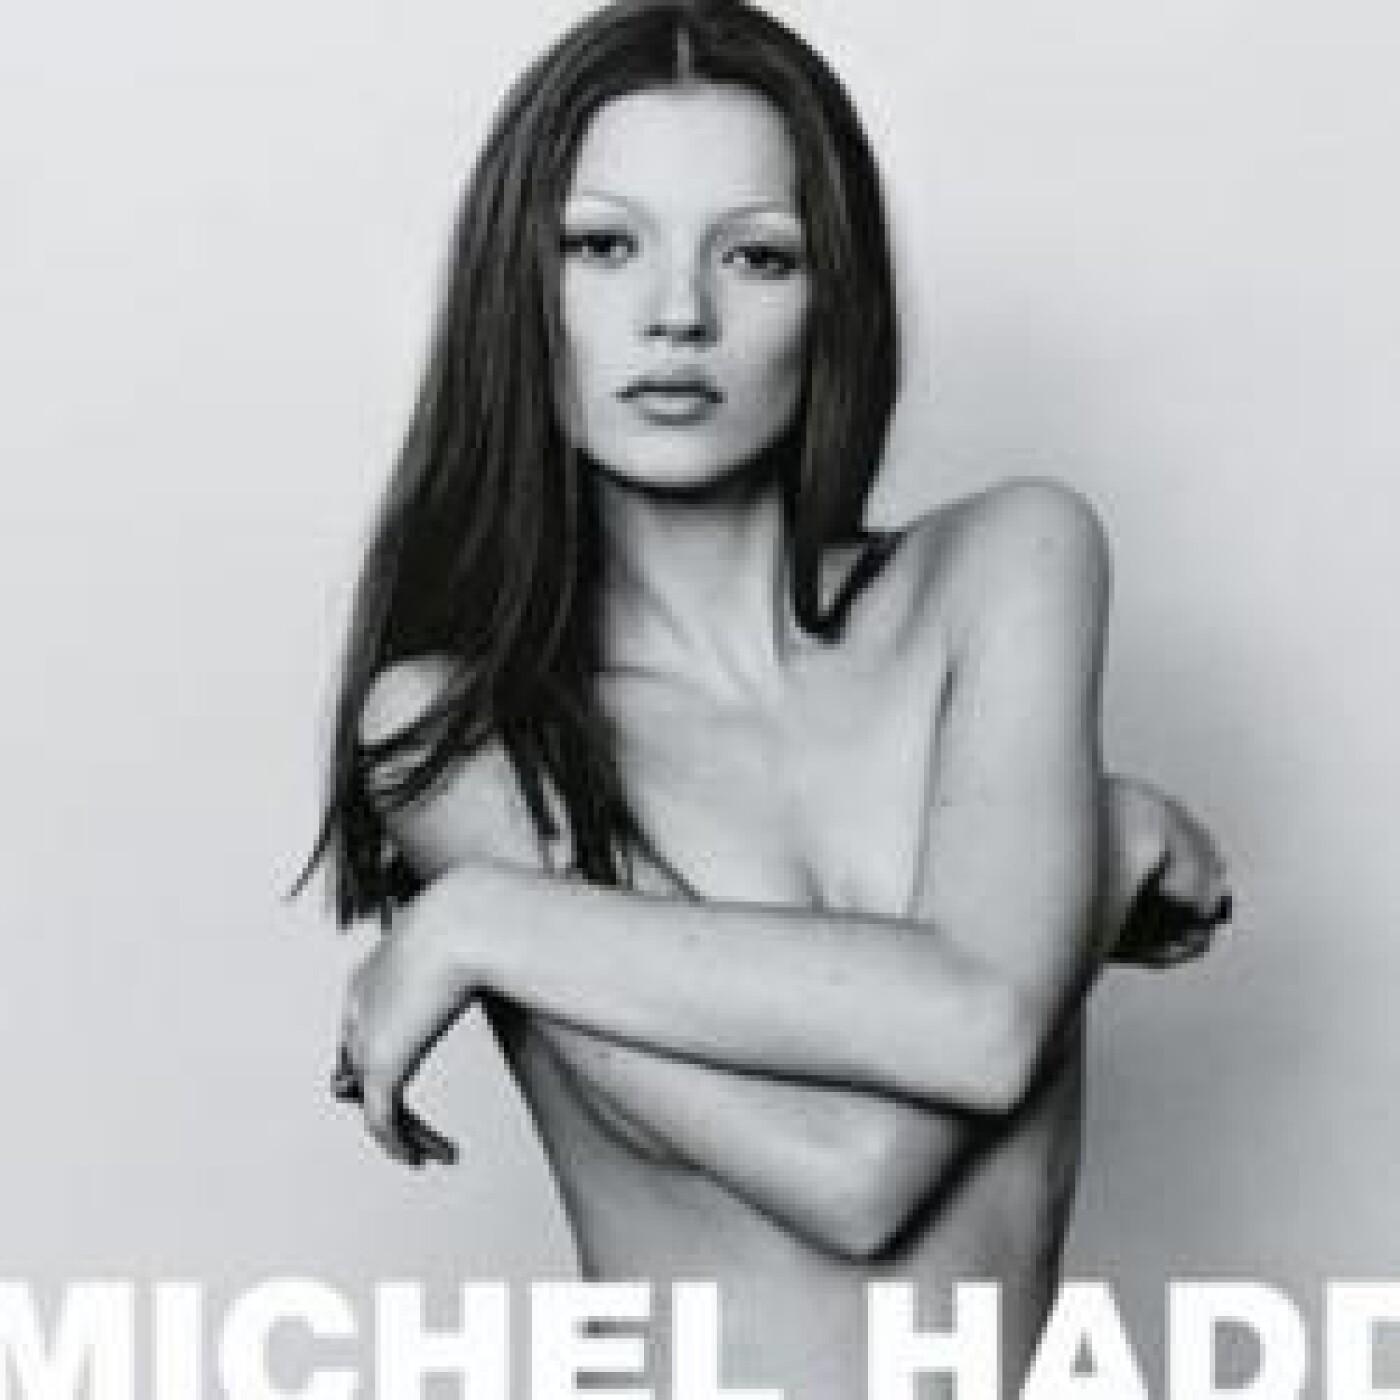 L'INTERVIEW DE MICHEL HADDI DANS L'HAPPY HOUR FG